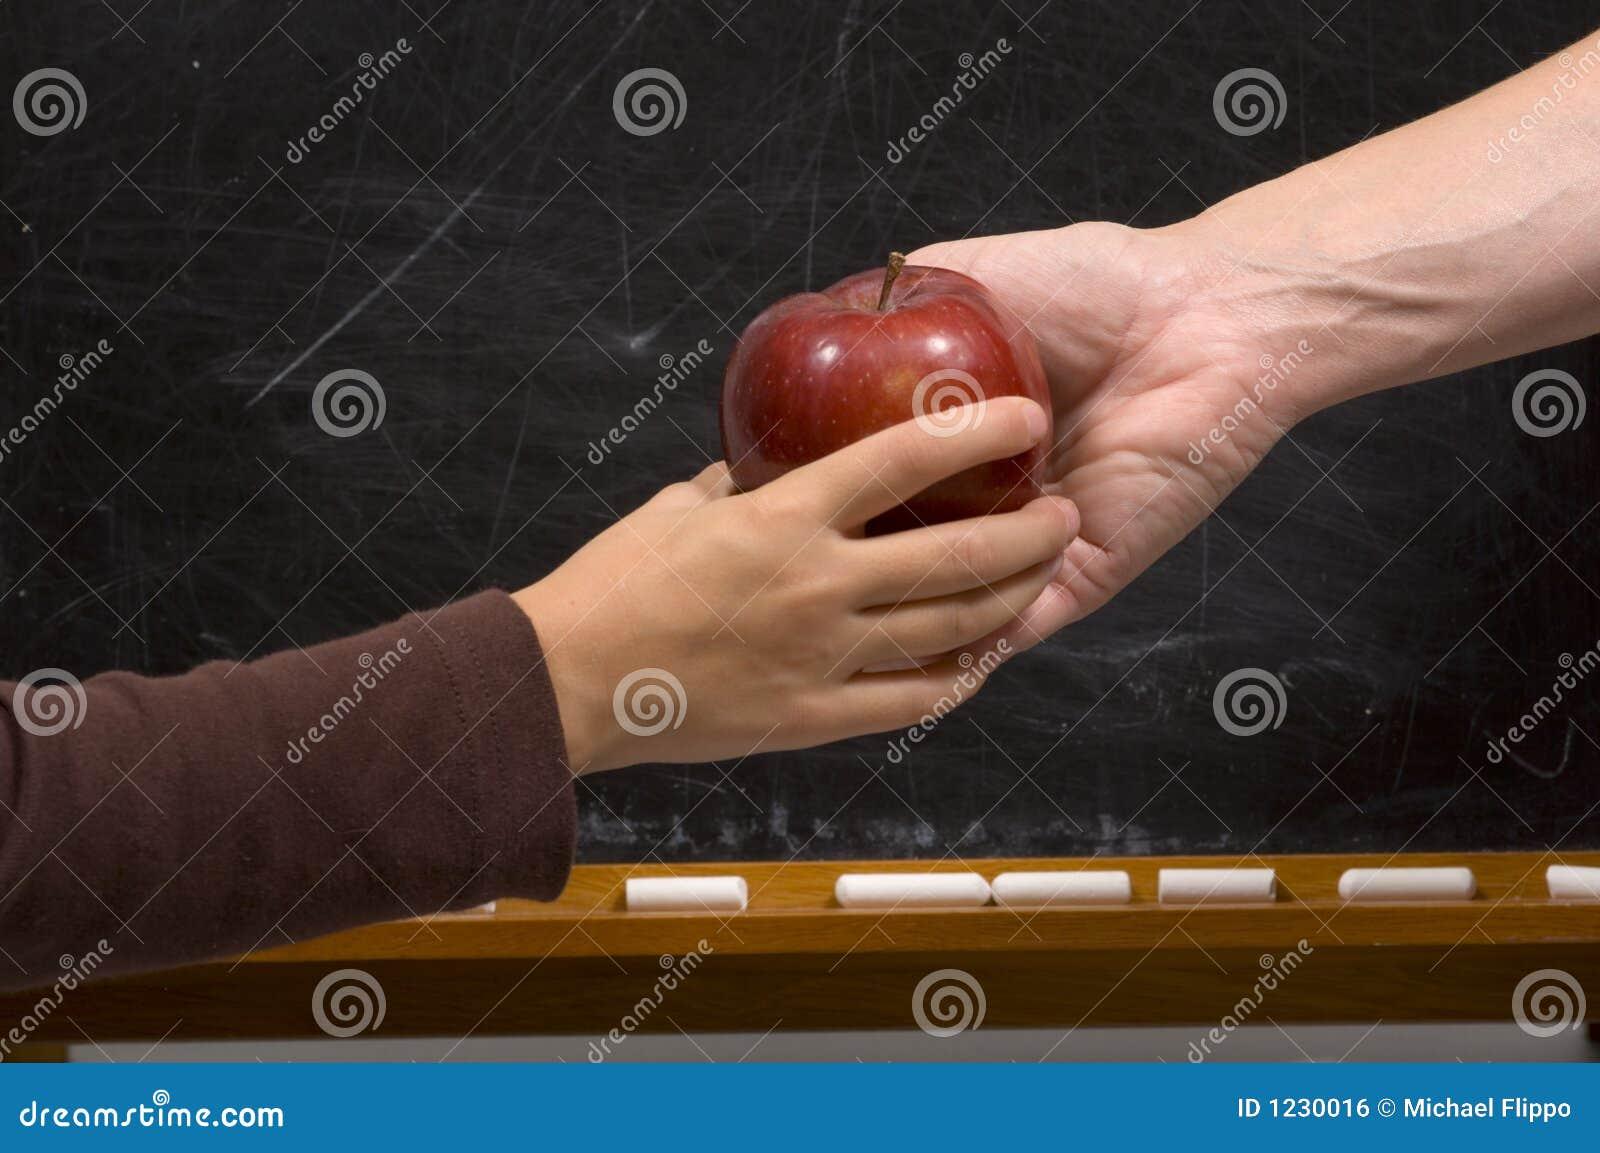 how to teach a hand shake